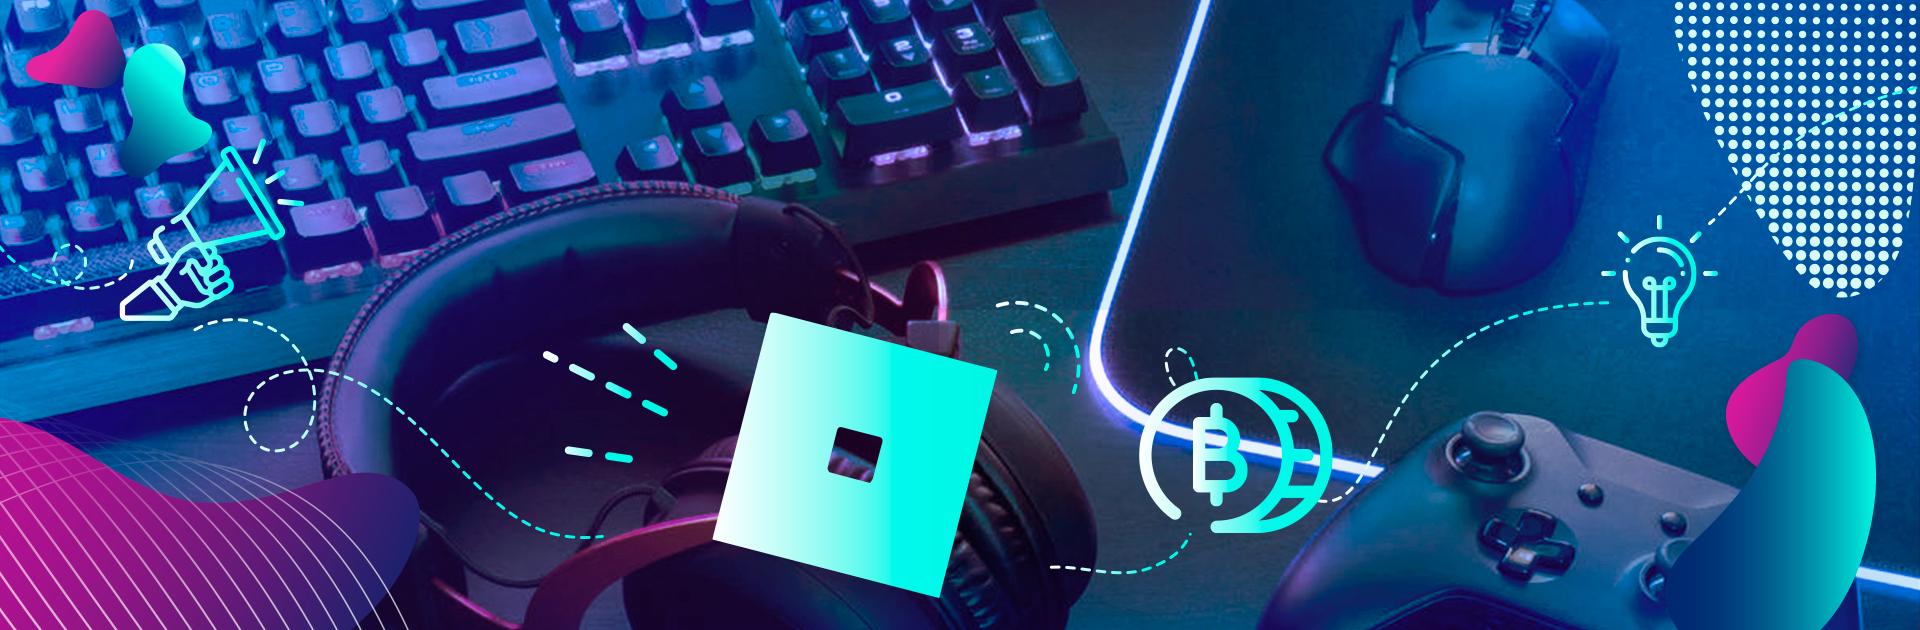 ROBLOX: Tra Minecraft e Second Life